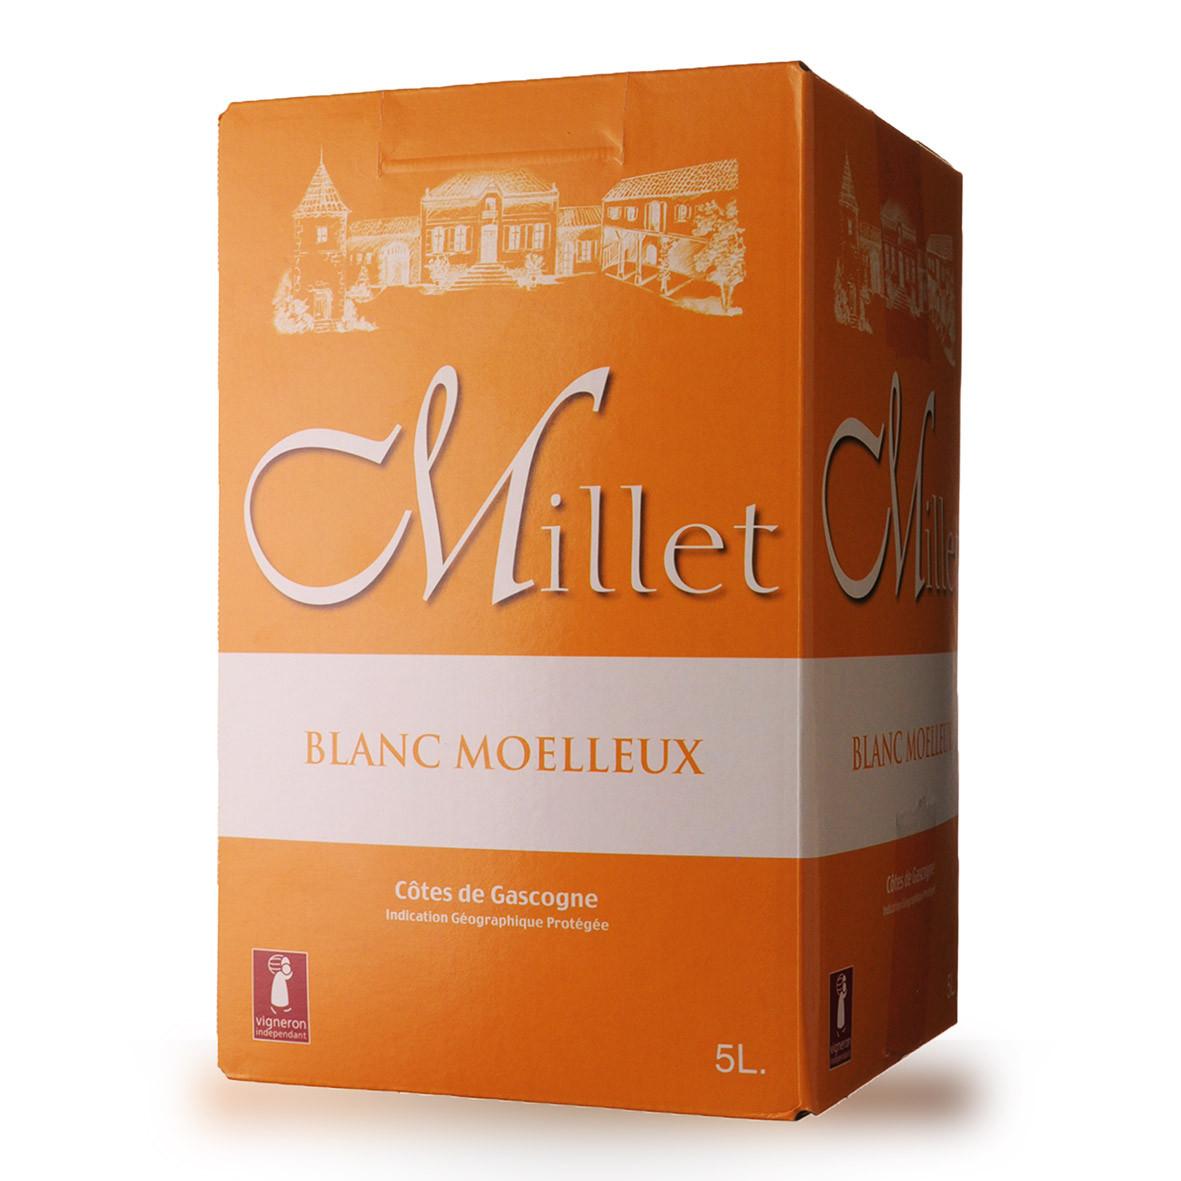 Bag-In-Box 5L Domaine de Millet Blanc Moelleux www.odyssee-vins.com